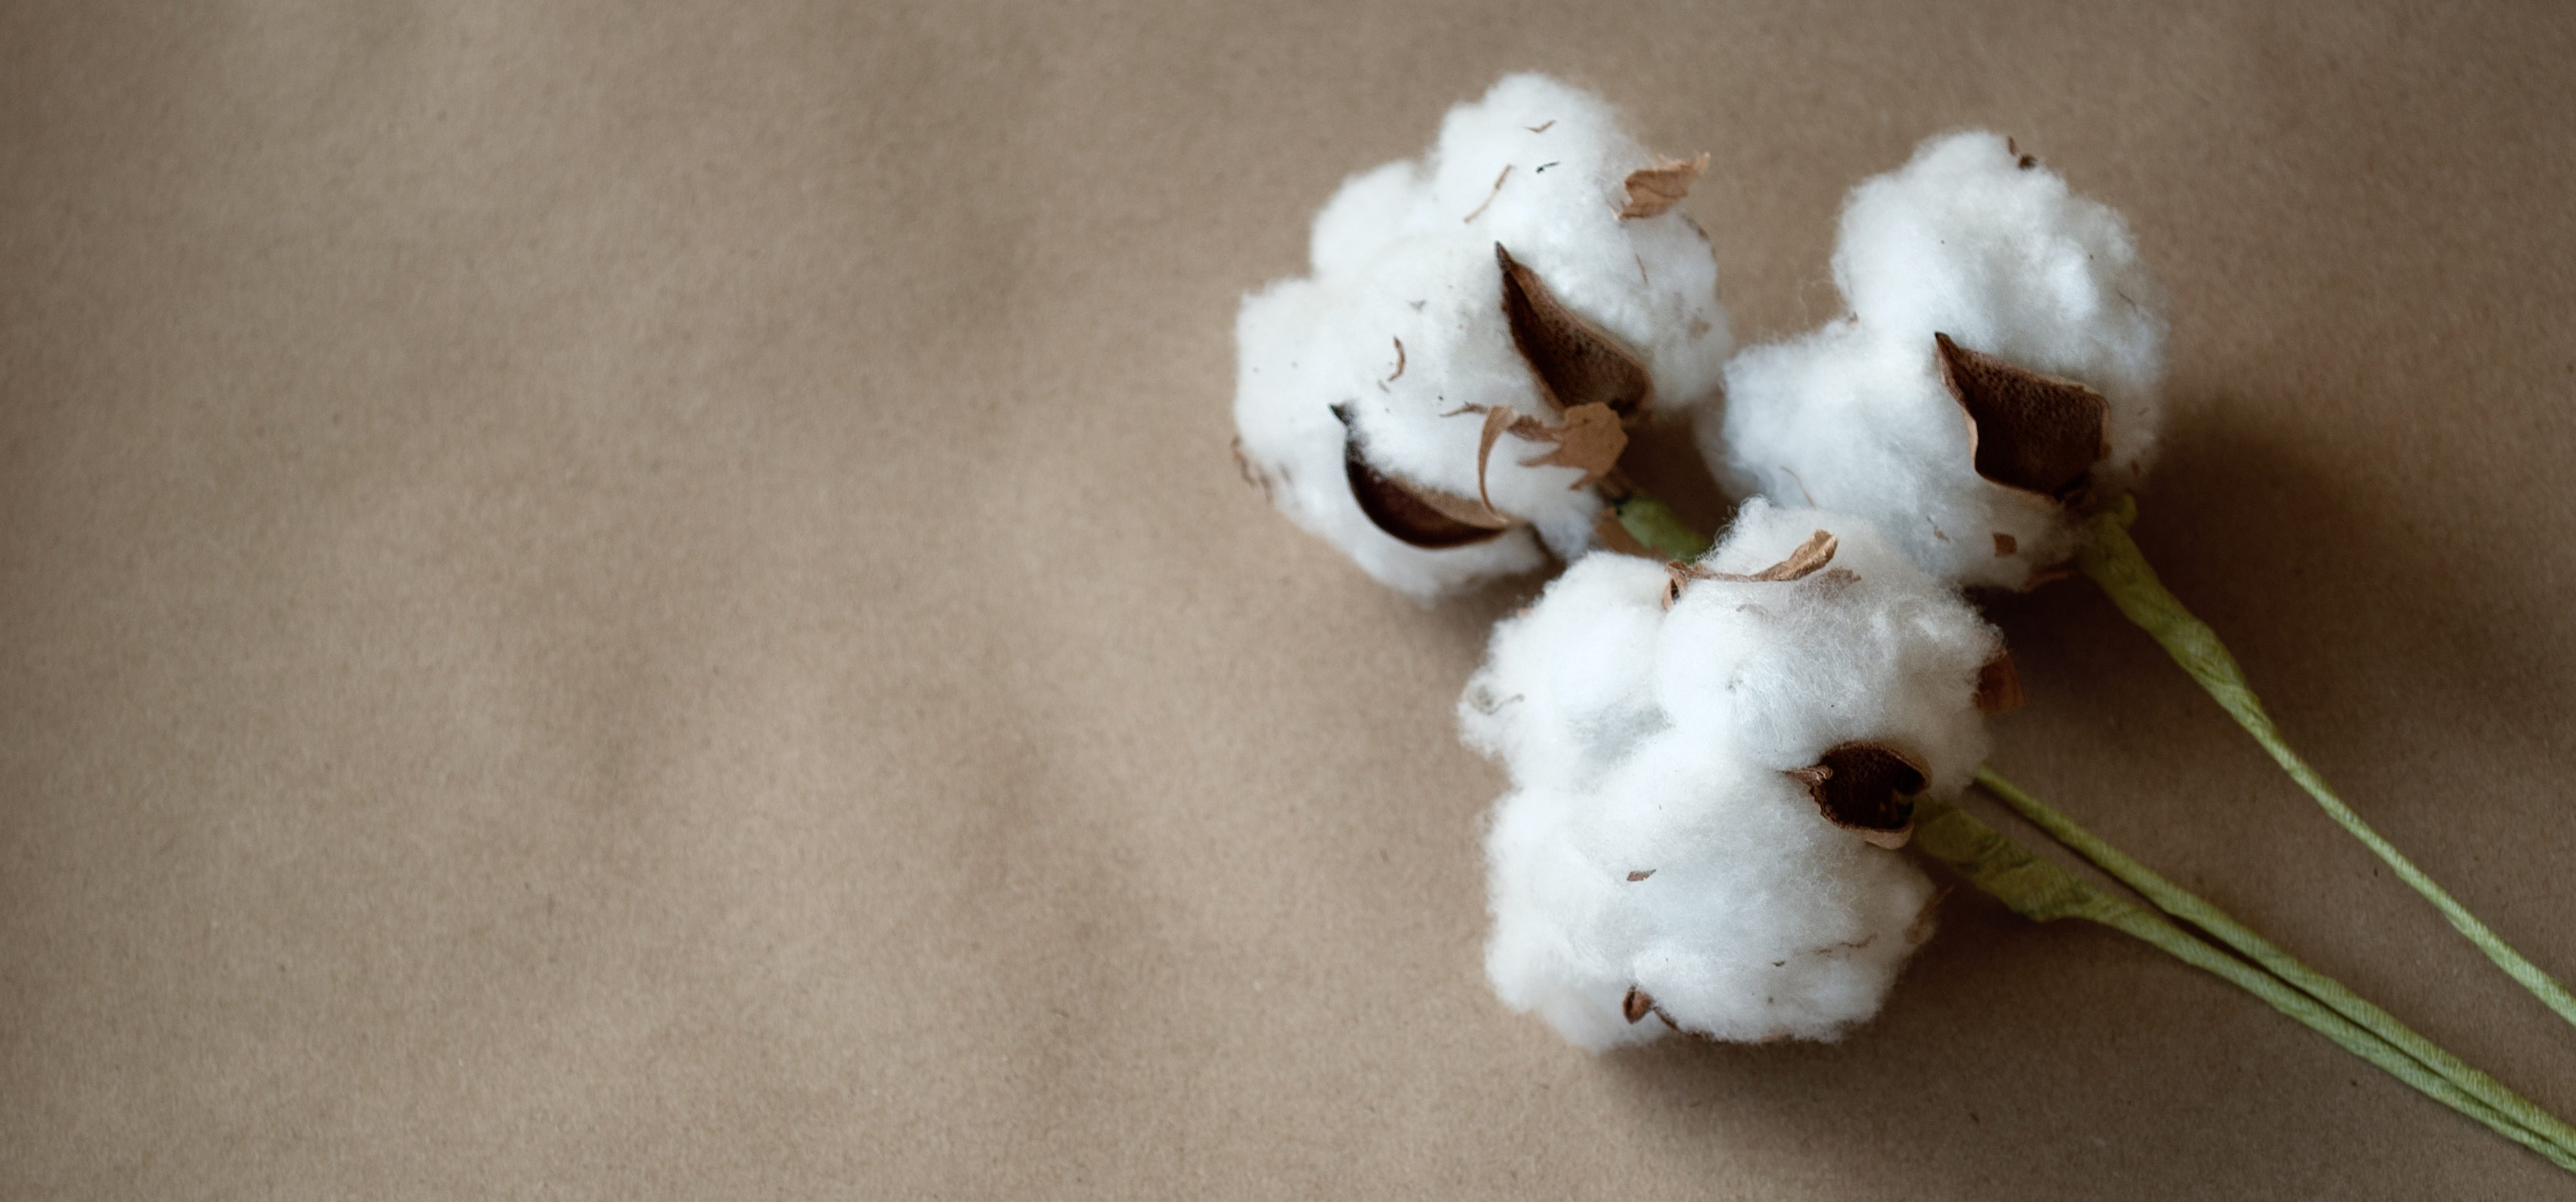 Cotton Wave Analysis – 23 December, 2019